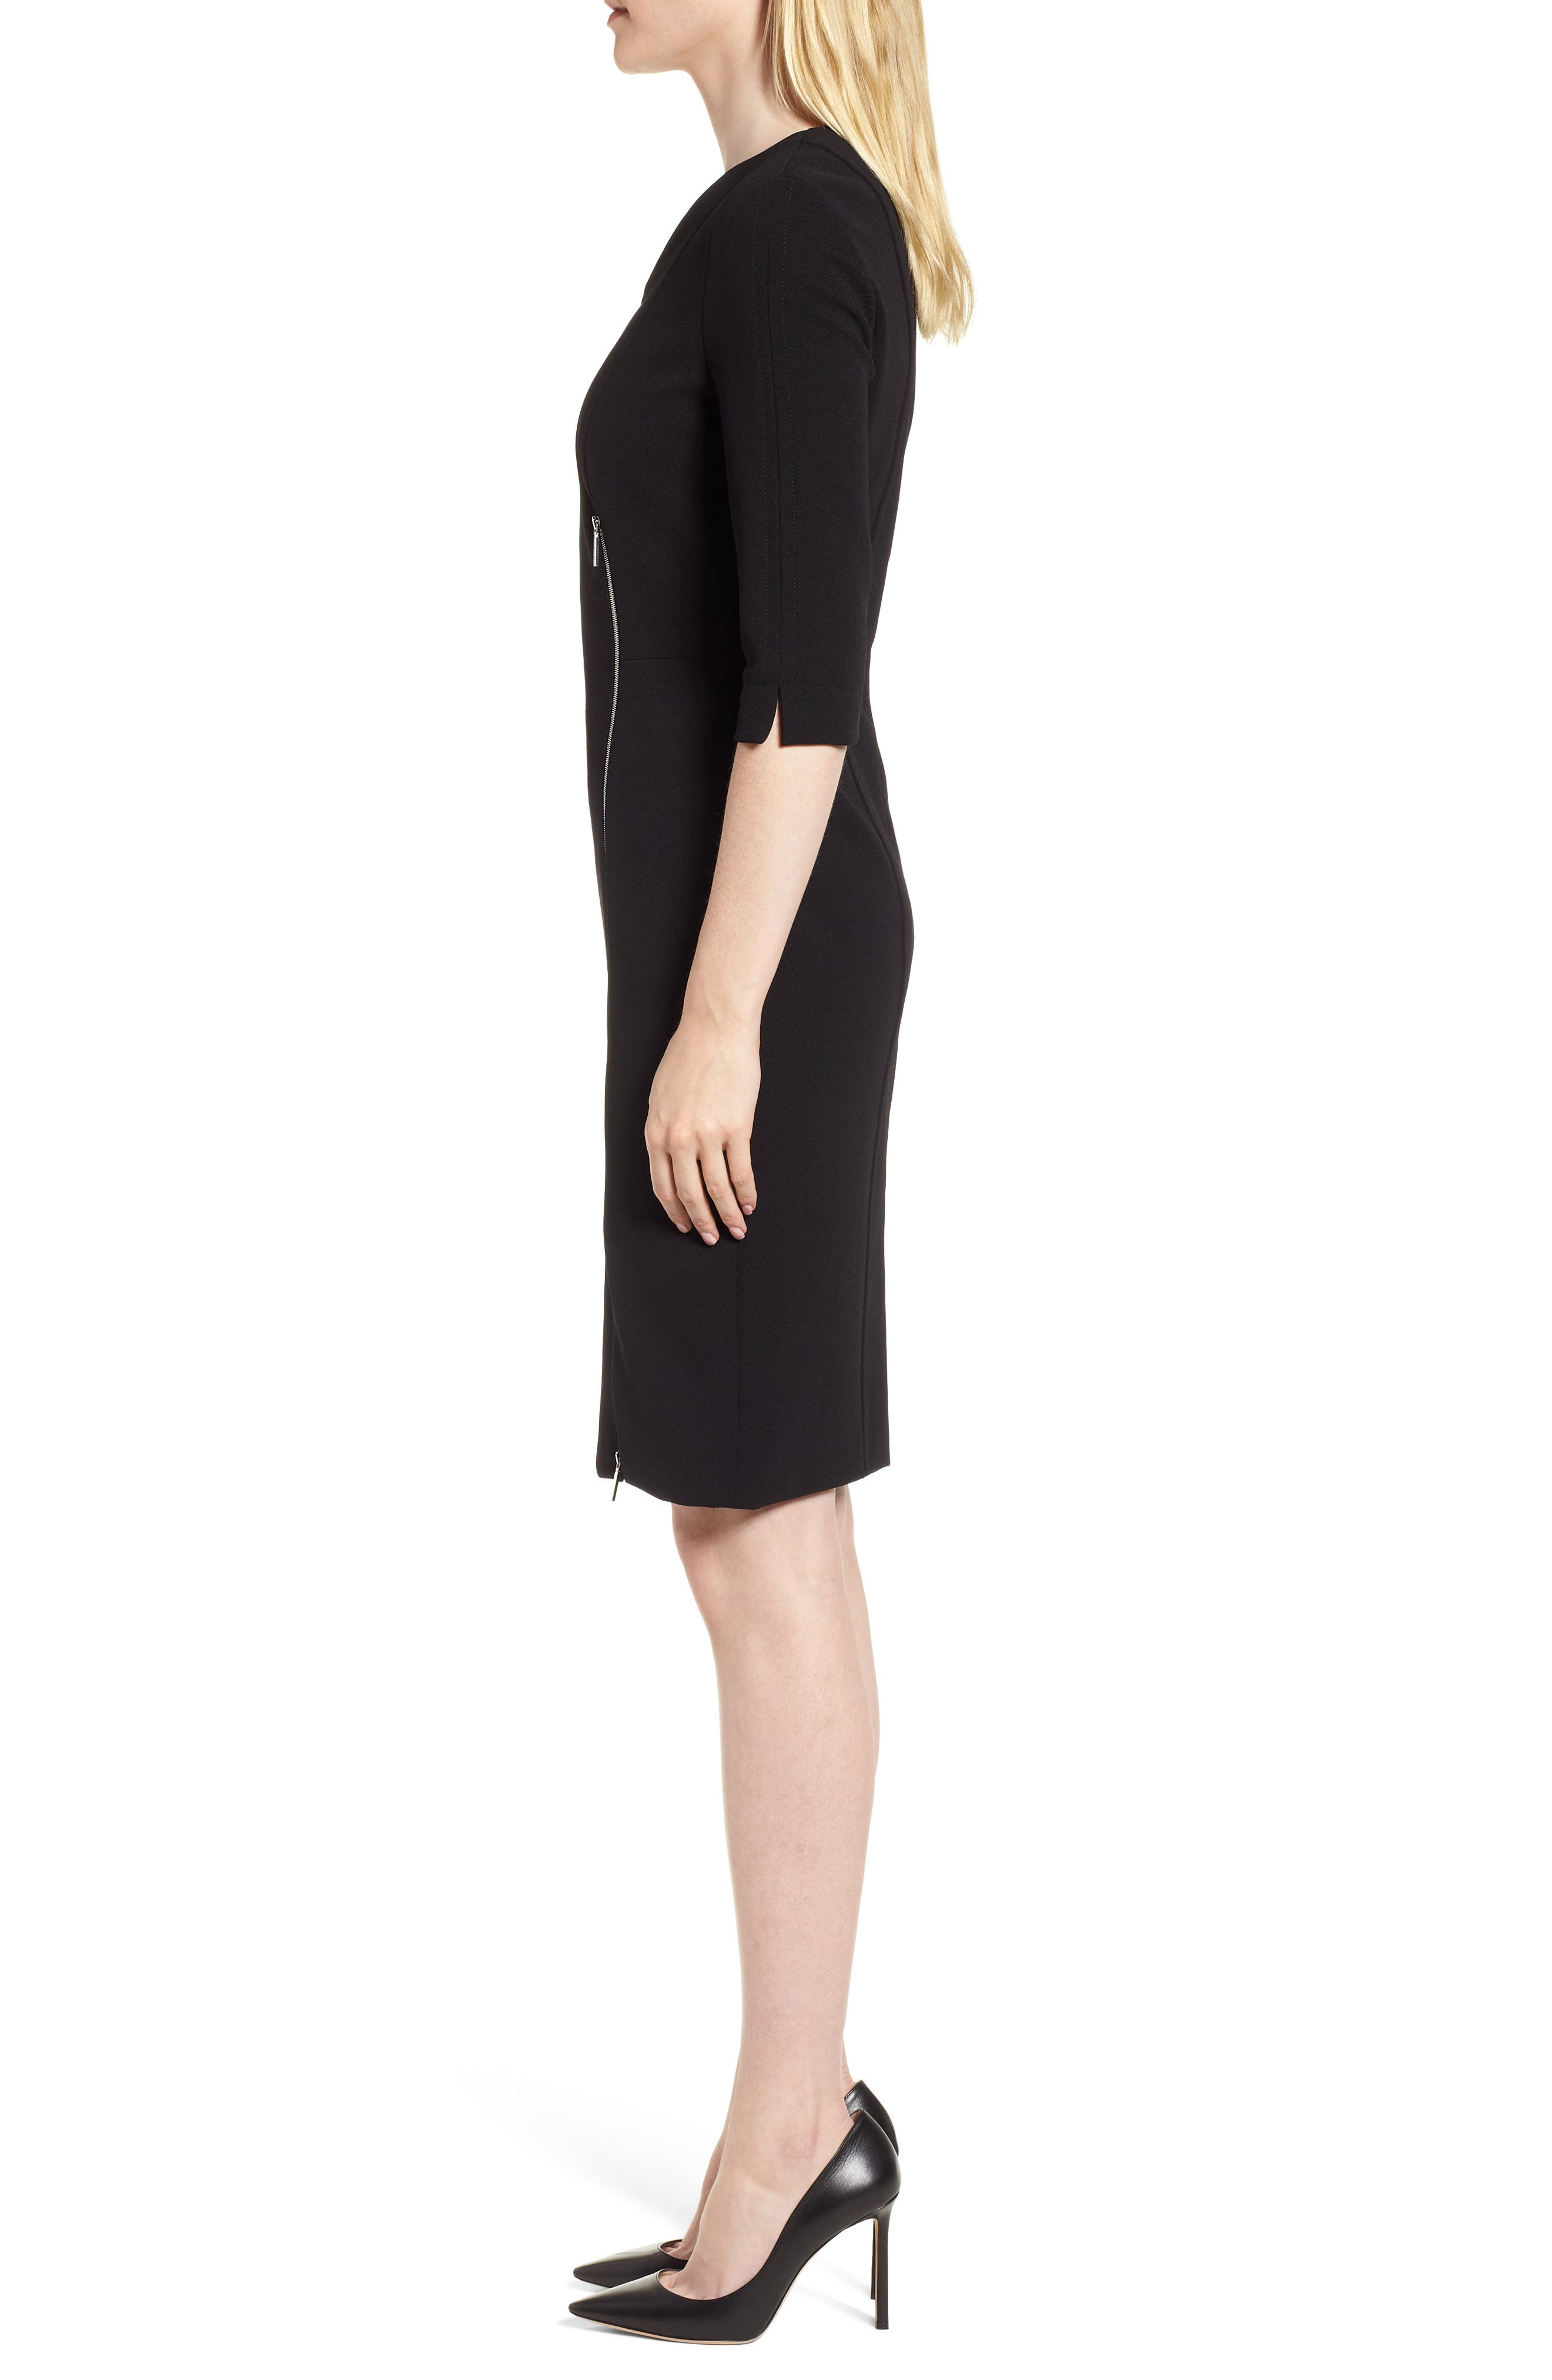 Deazema Twill Jersey Dress,                             Alternate thumbnail 3, color,                             001